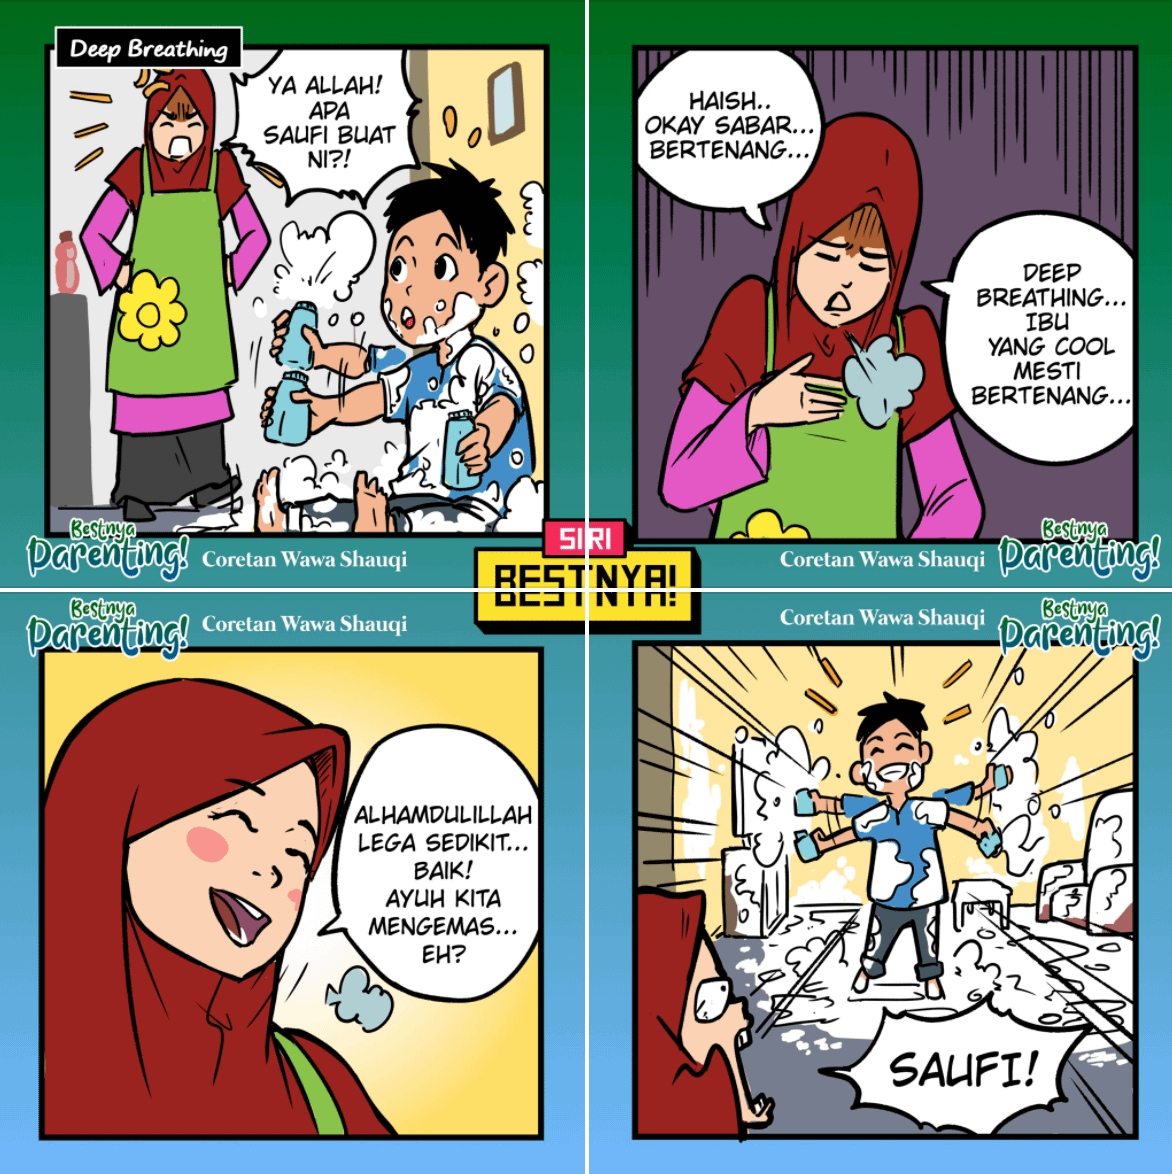 Komik Bestnya Parenting karya Wawa Shauqi, Nazr Syaff dan Khairul Khairudin